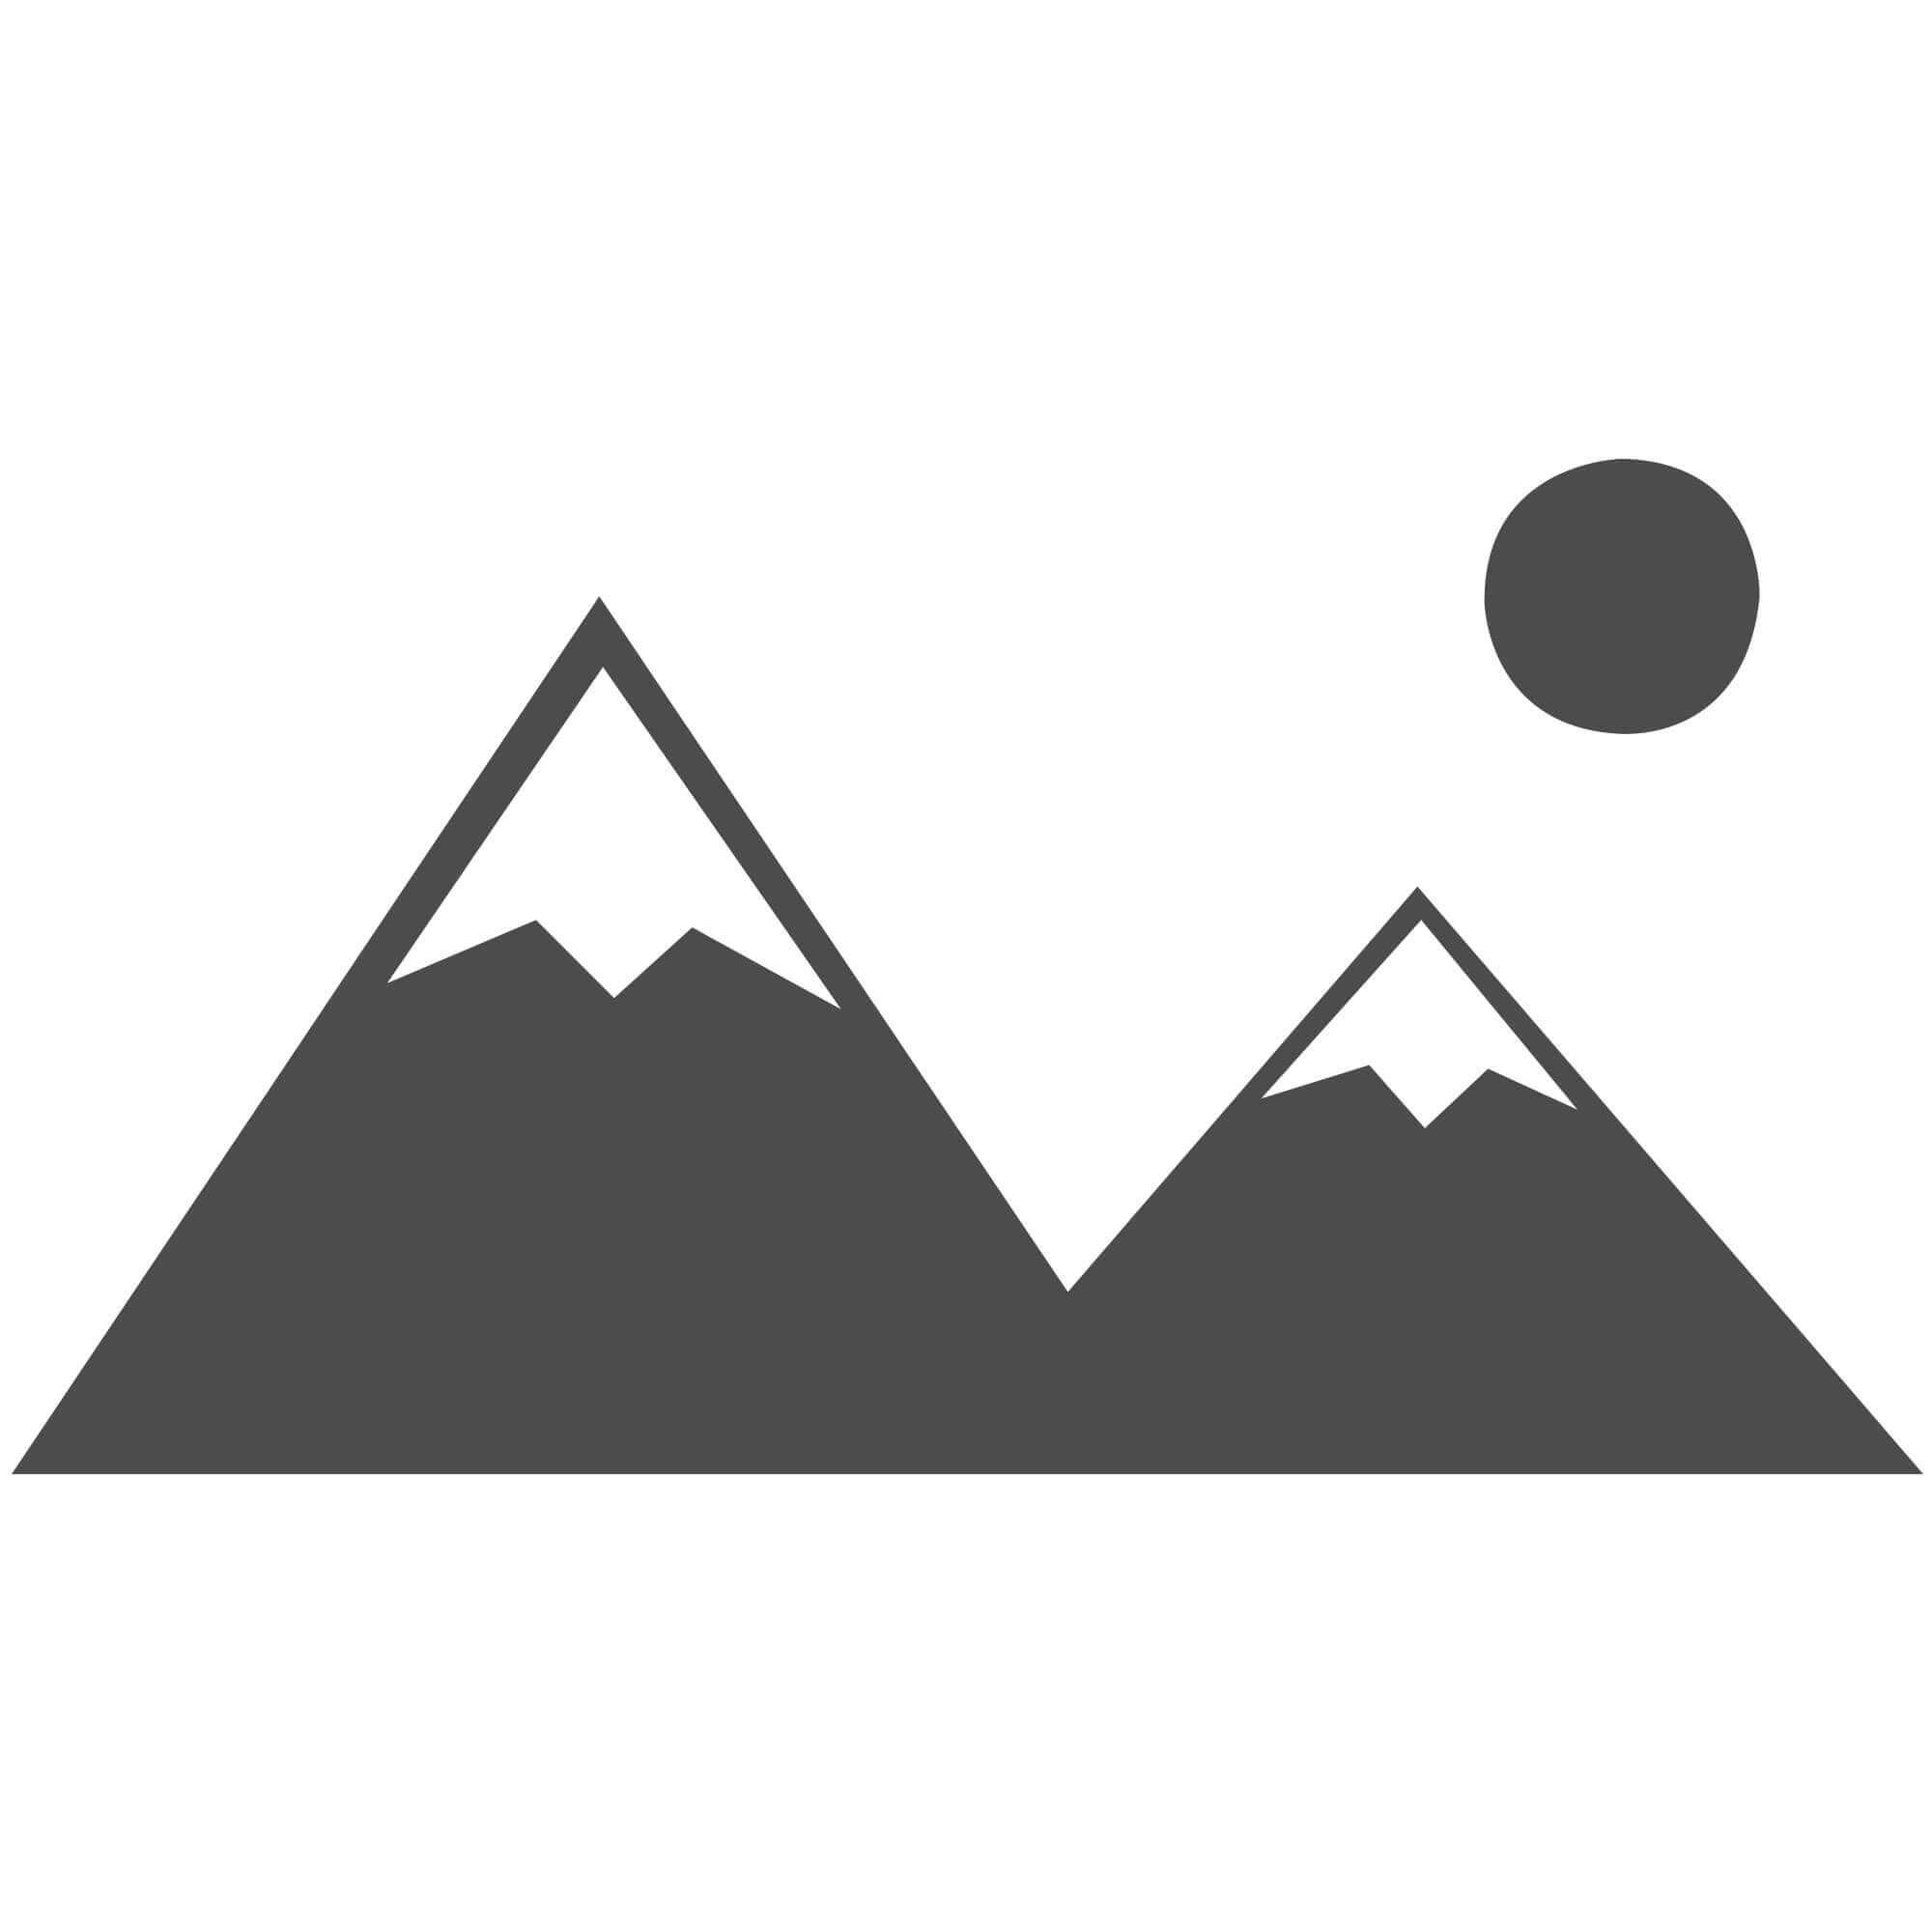 "Infinite Splinter Purple Rug - Size 120 x 170 cm (4' x 5'7"")"